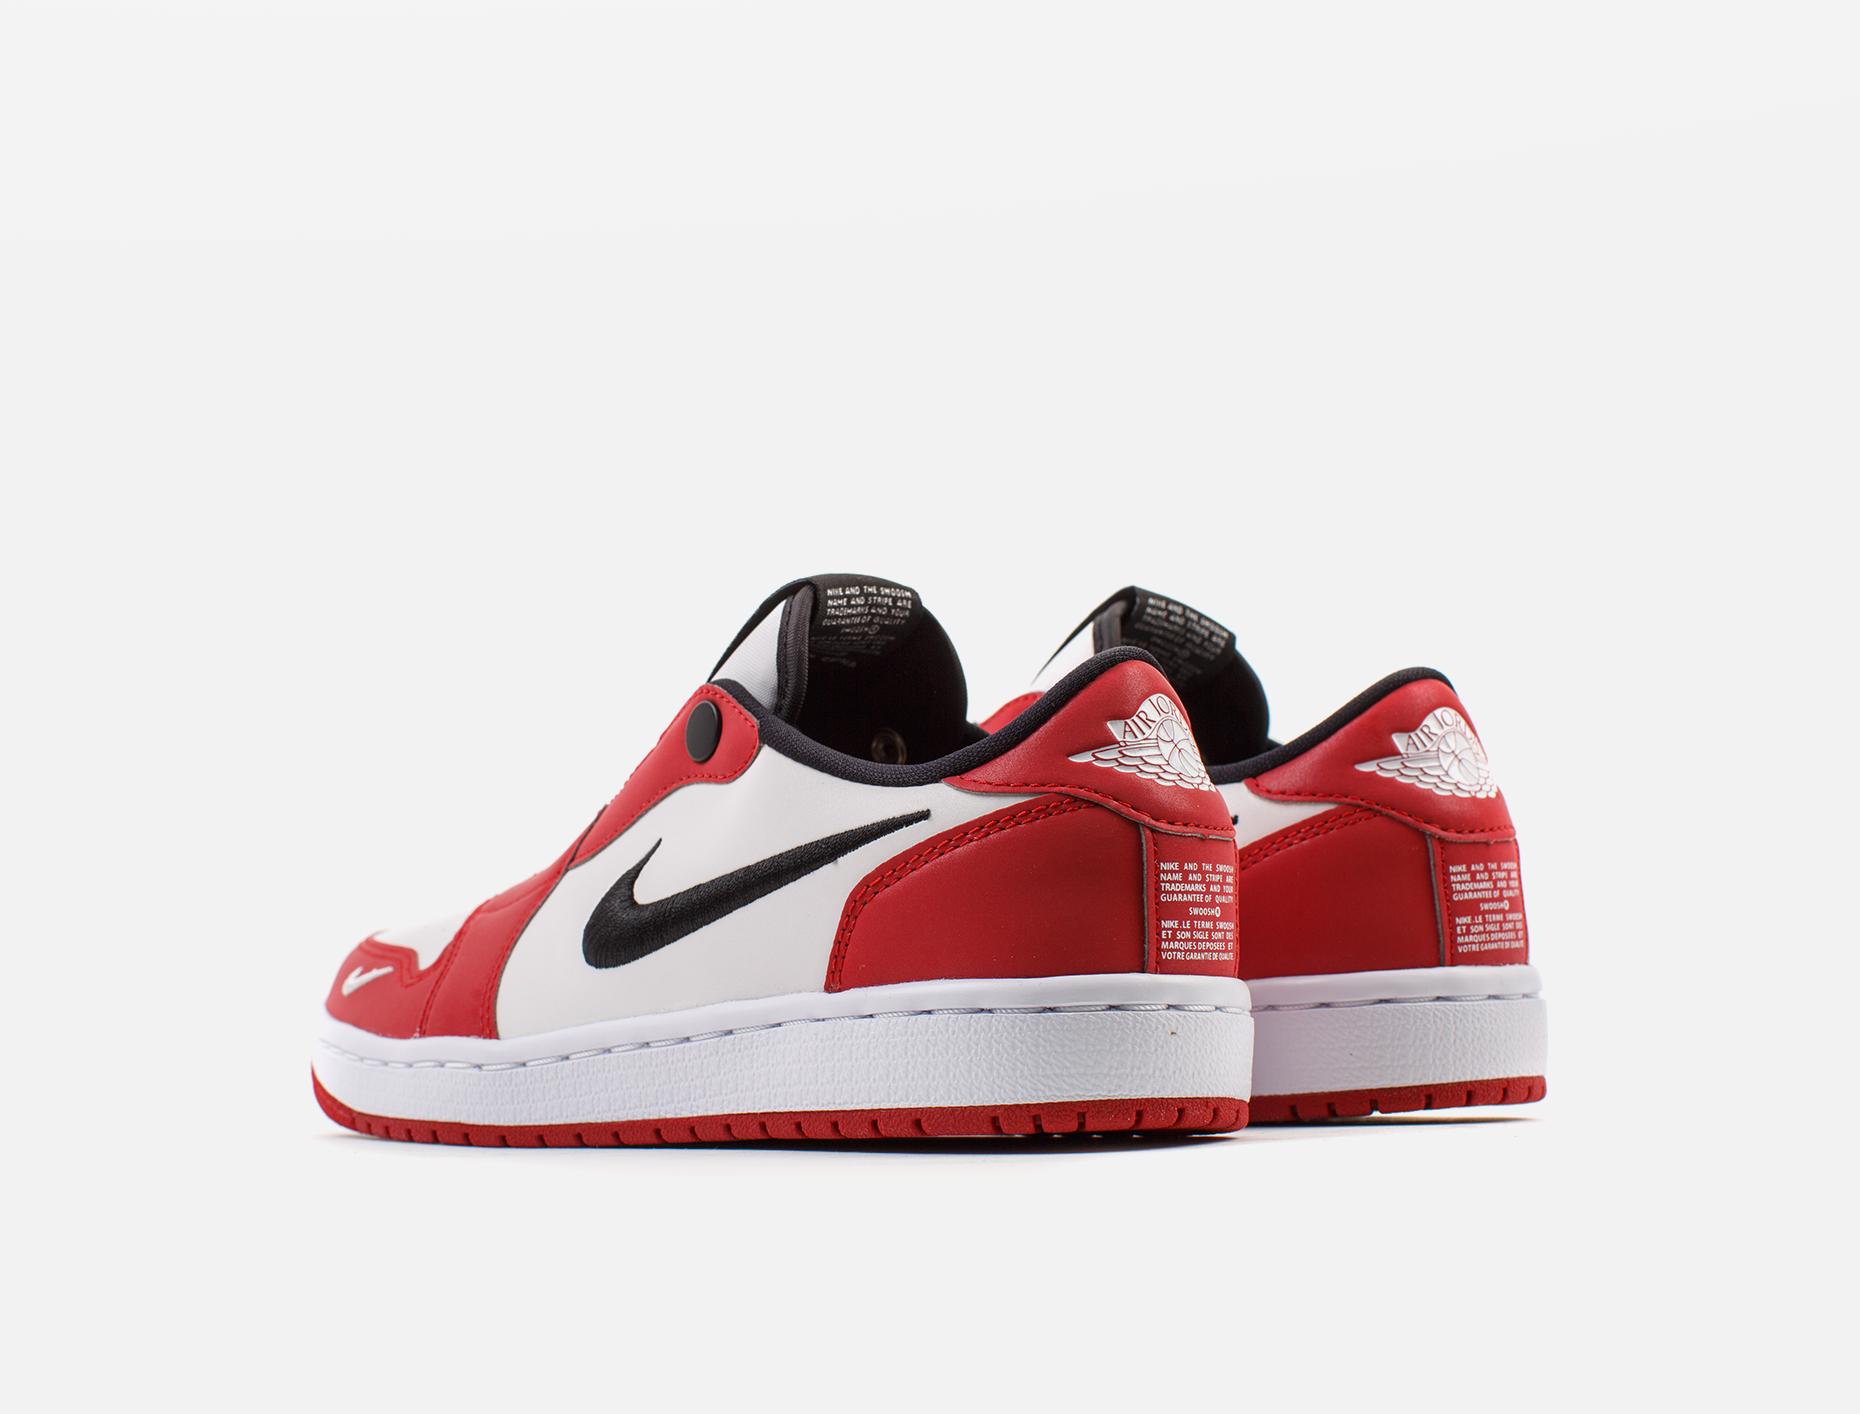 f62fa964c98c0f ... Preview  x Sheila Rashid Air Jordan 1 Retro Low Sneaker